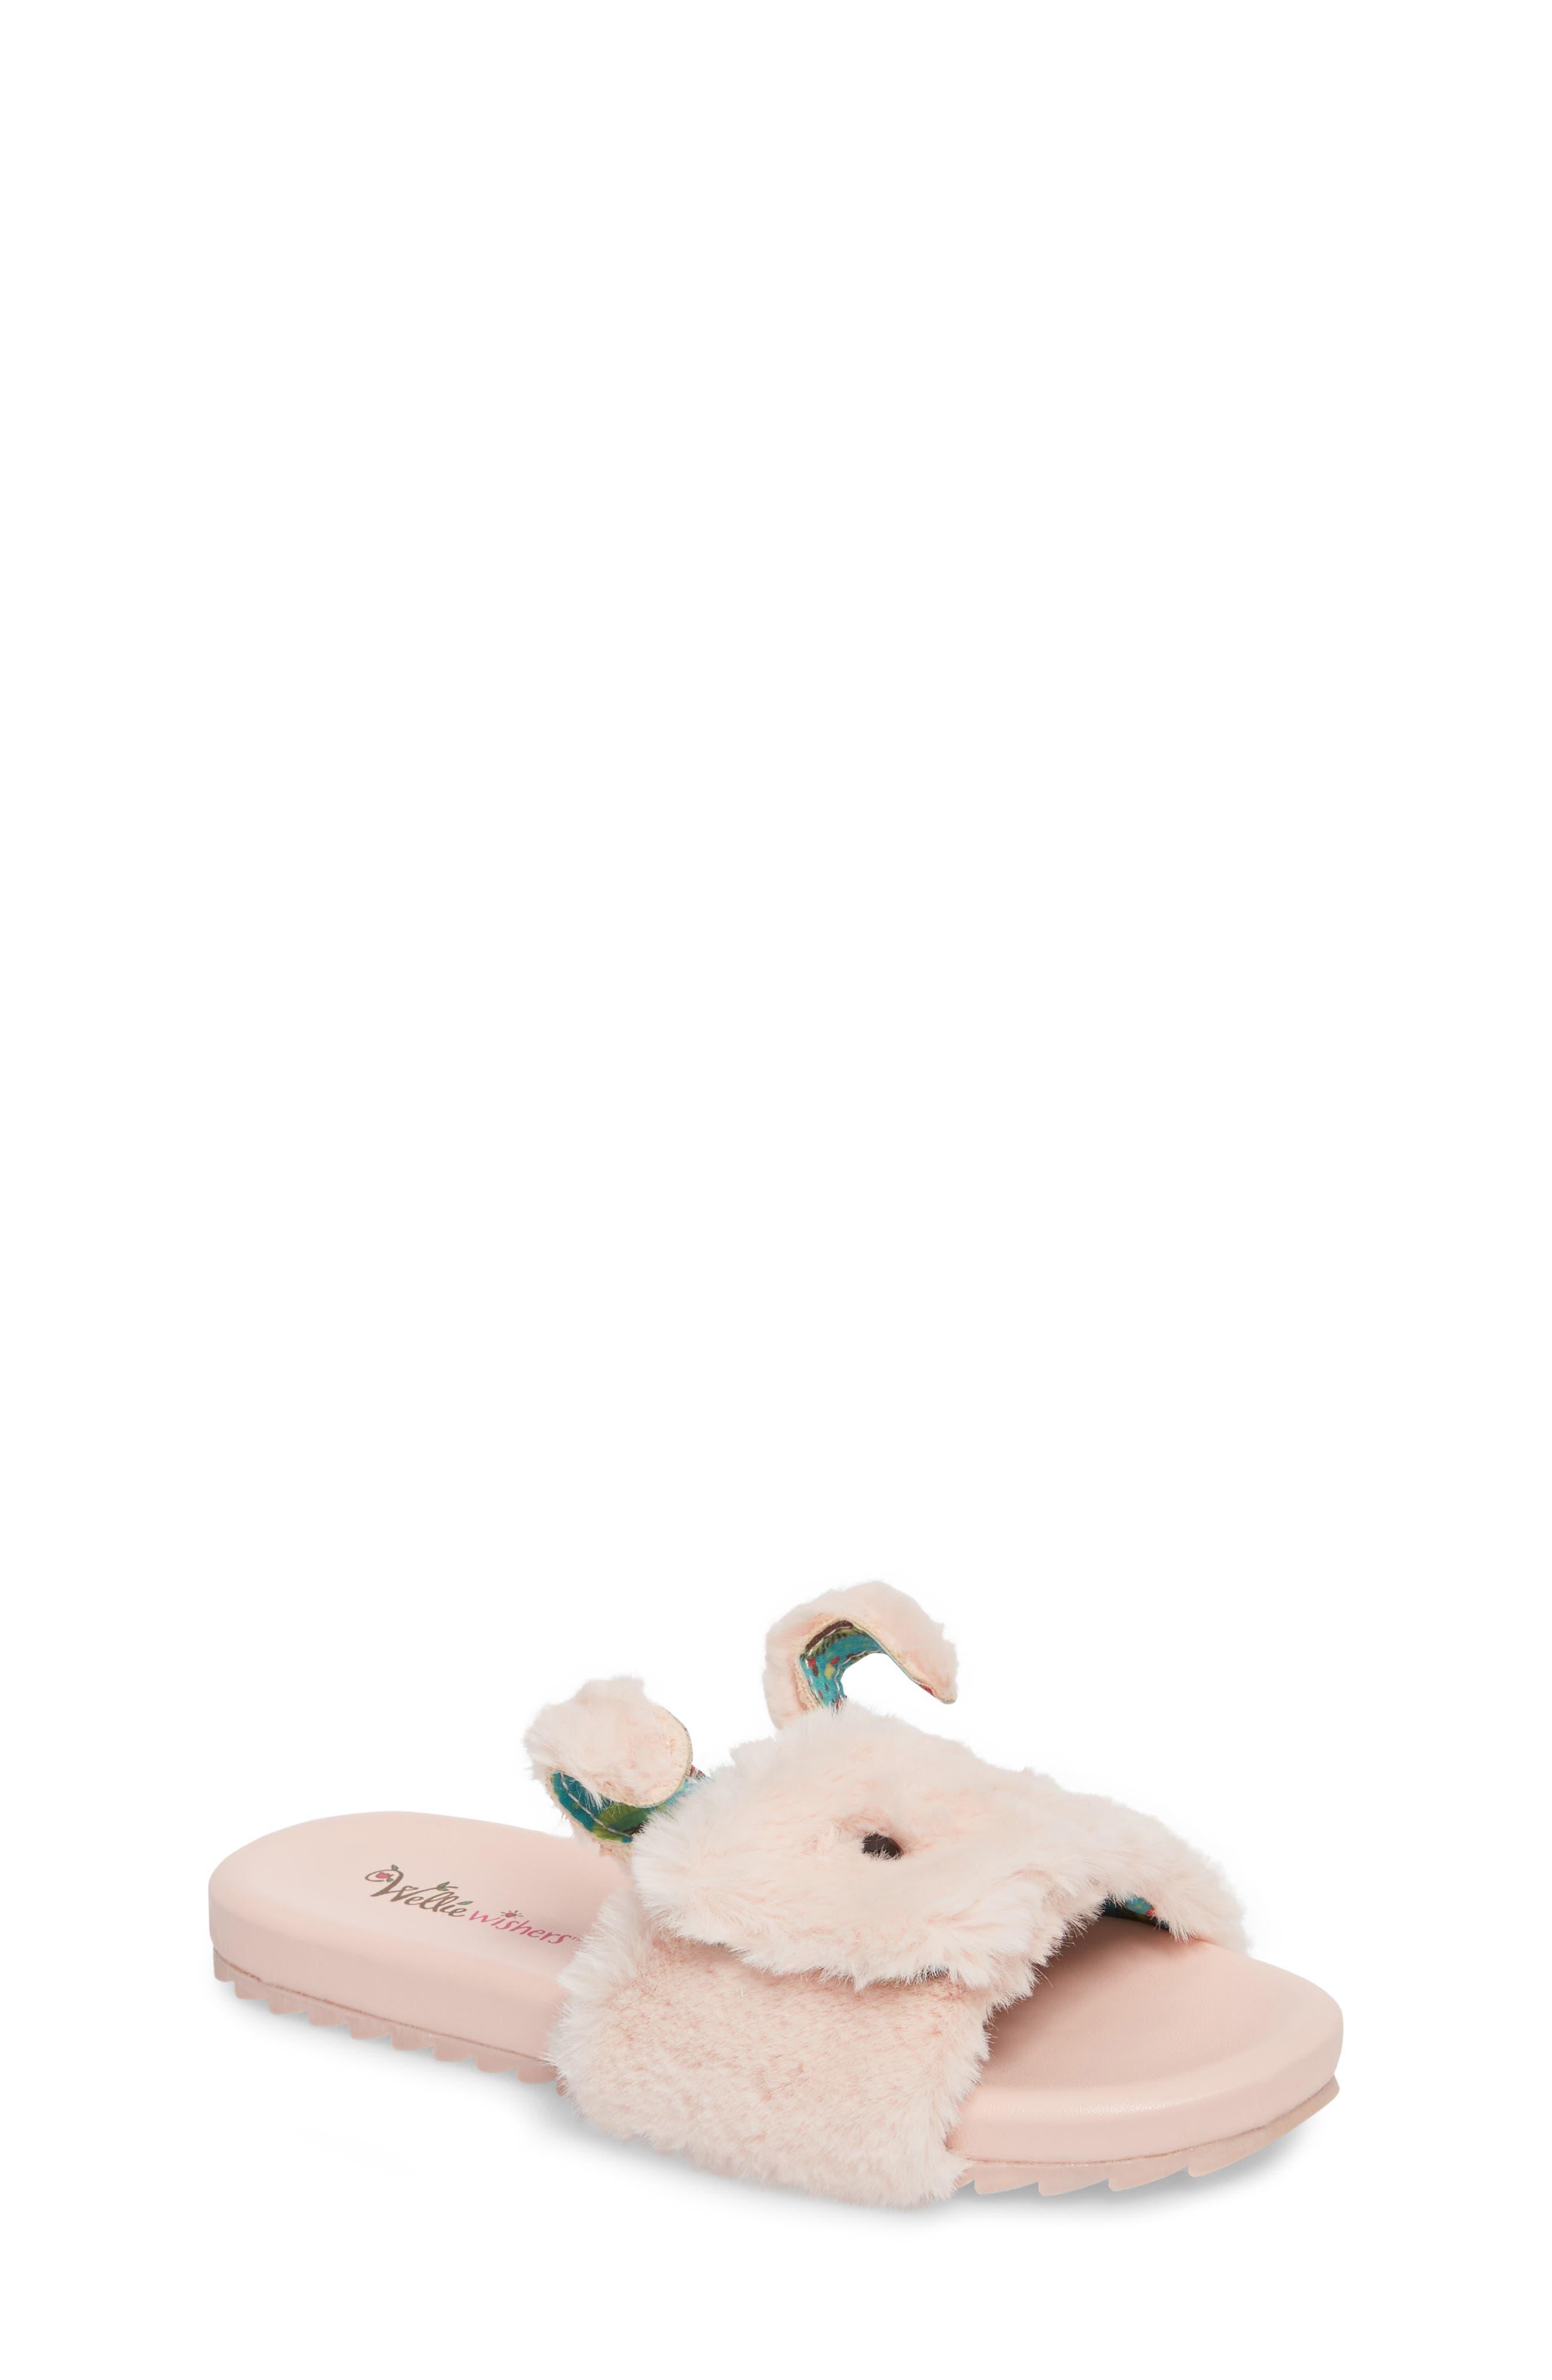 Willa Carrot Faux Fur Slide Sandal,                             Main thumbnail 1, color,                             650